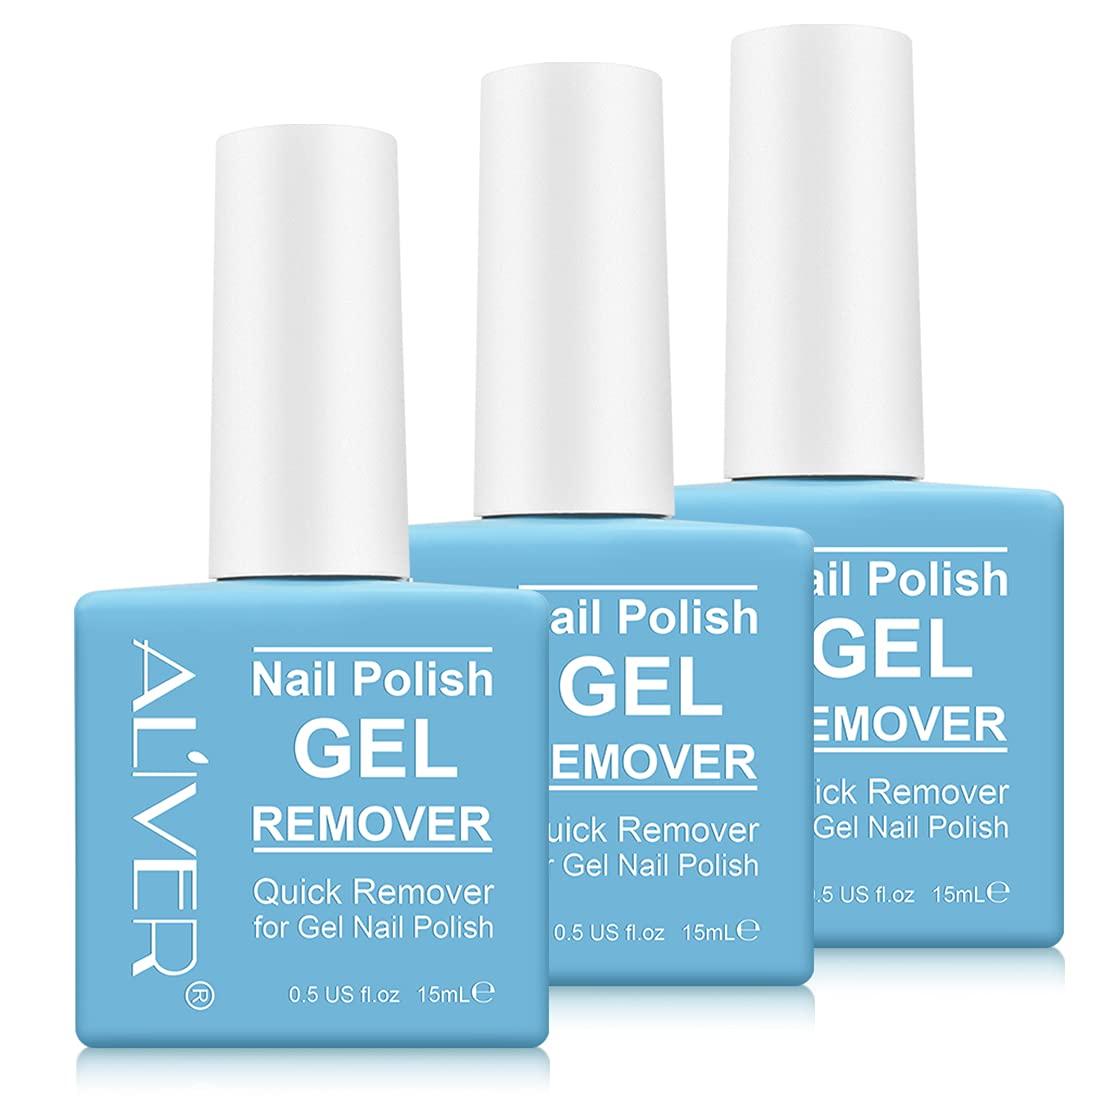 Magic Gel Nail Polish Remover Professional Long Beach Mall Louisville-Jefferson County Mall Removes Soak-Off